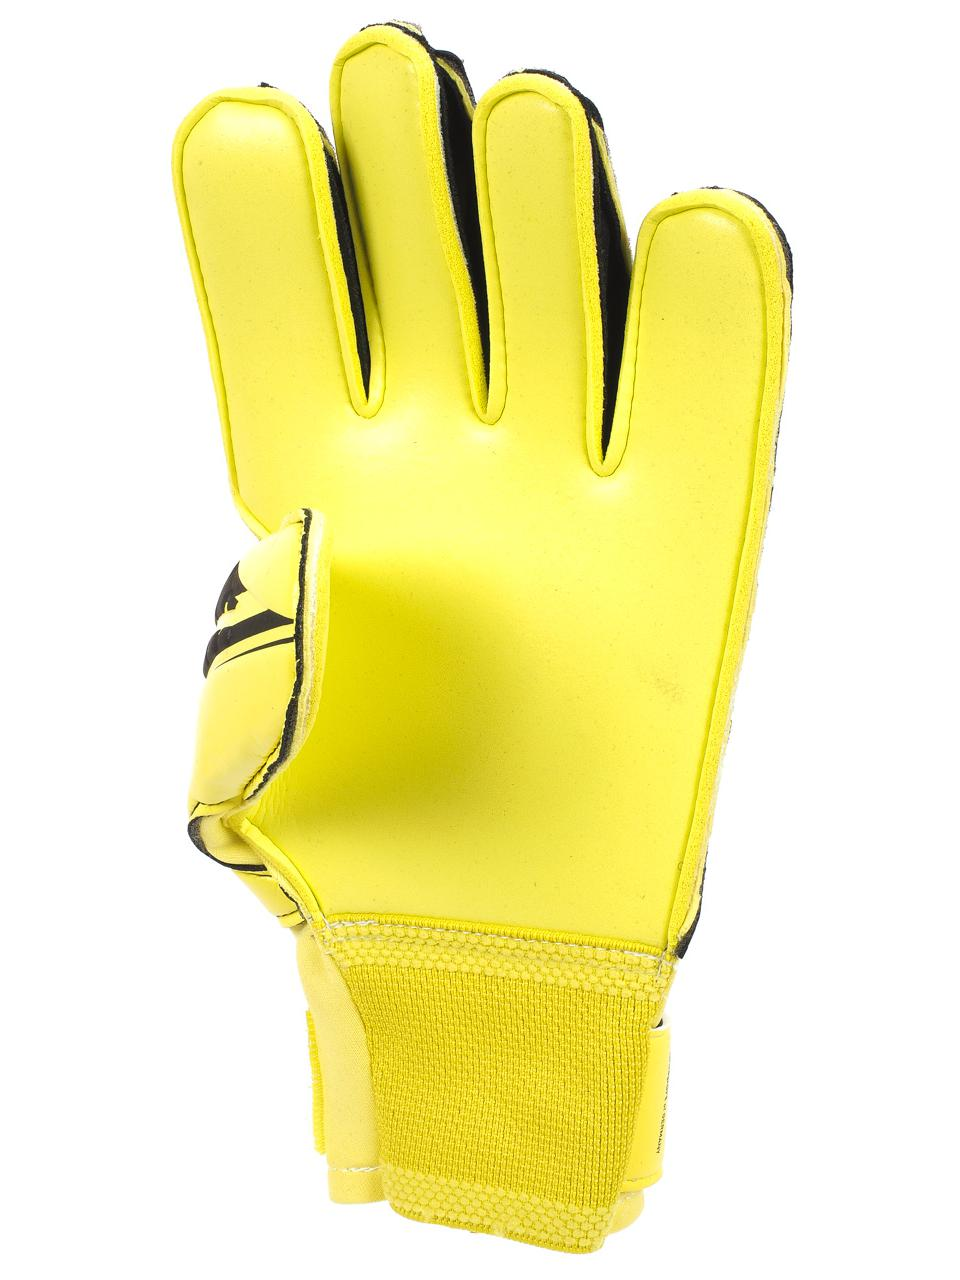 Gants-gardien-football-Uhlsport-Elm-soft-pro-h-Jaune-75371-Neuf